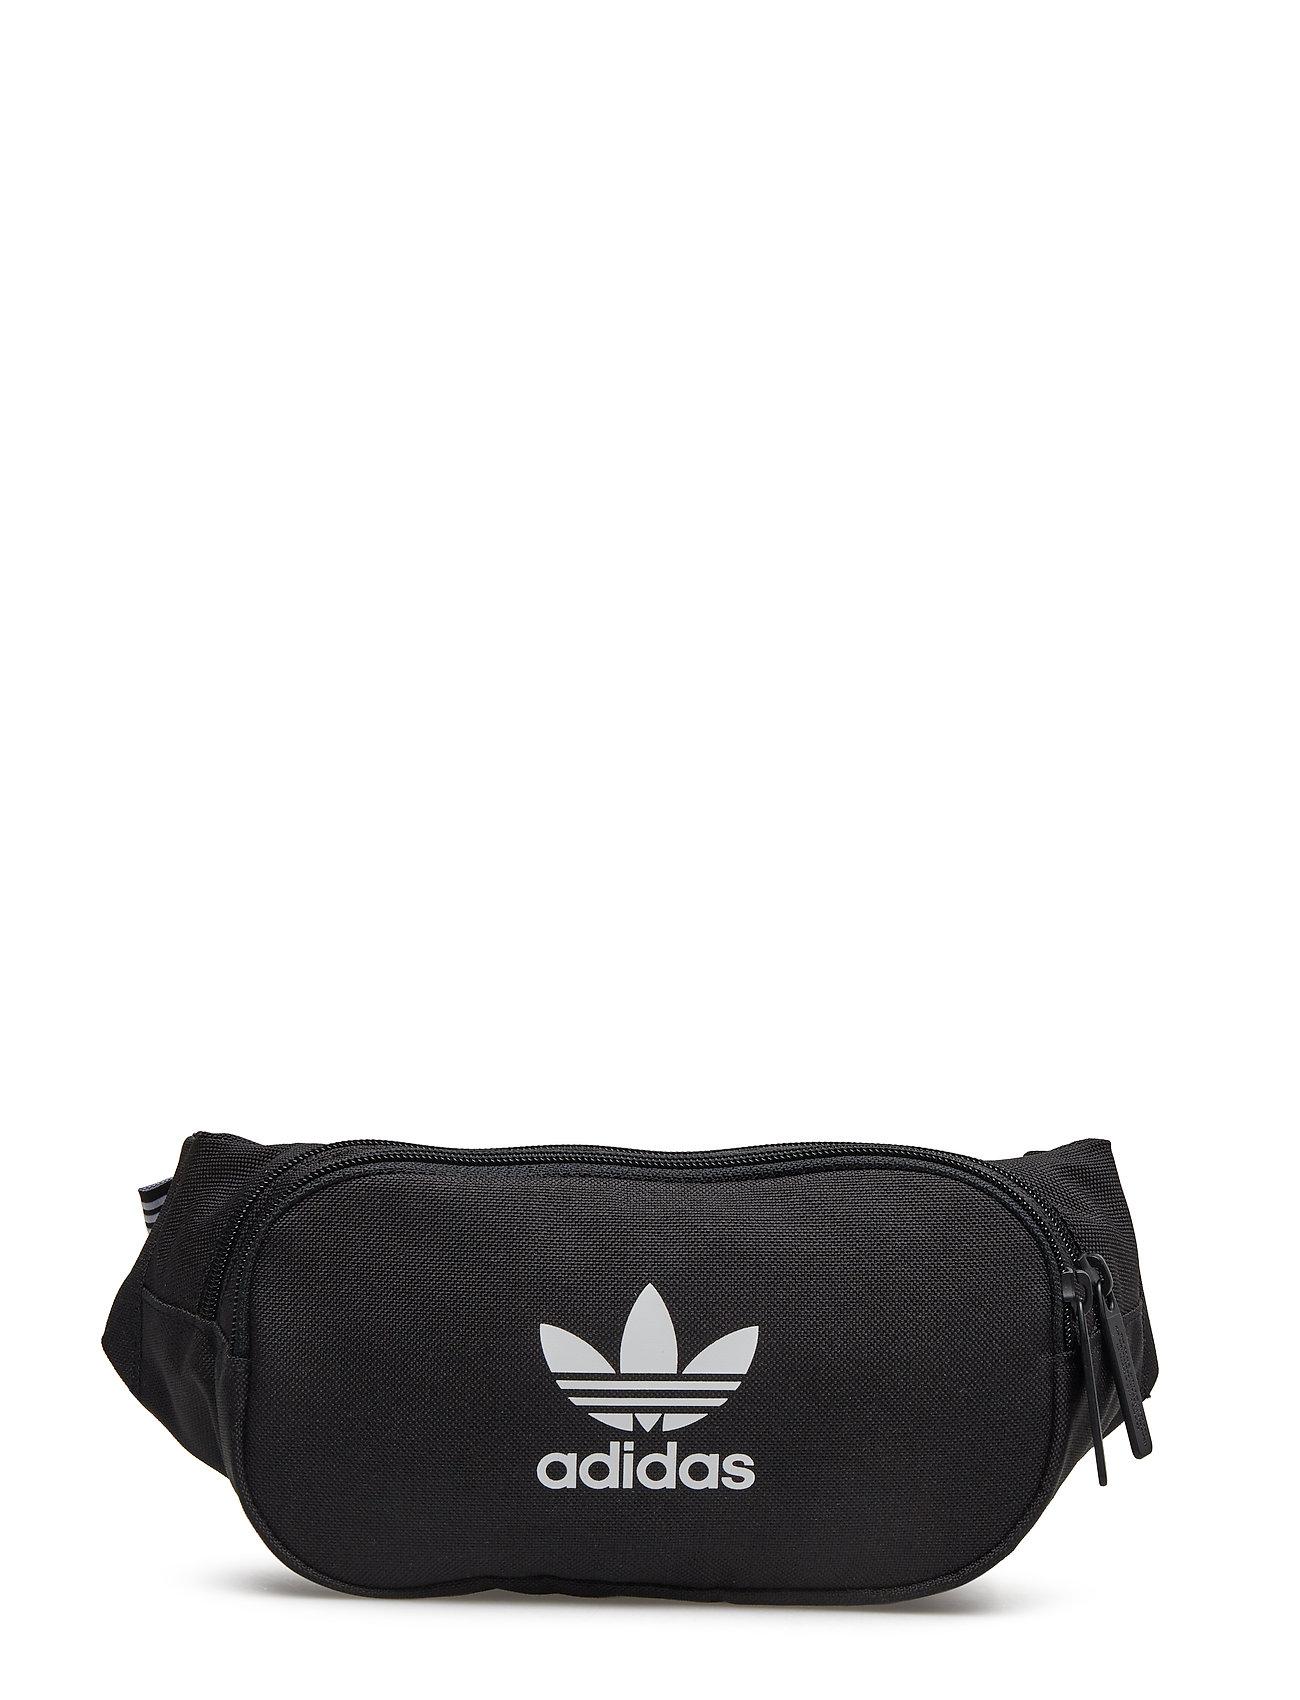 adidas Originals ESSENTIAL CBODY - BLACK